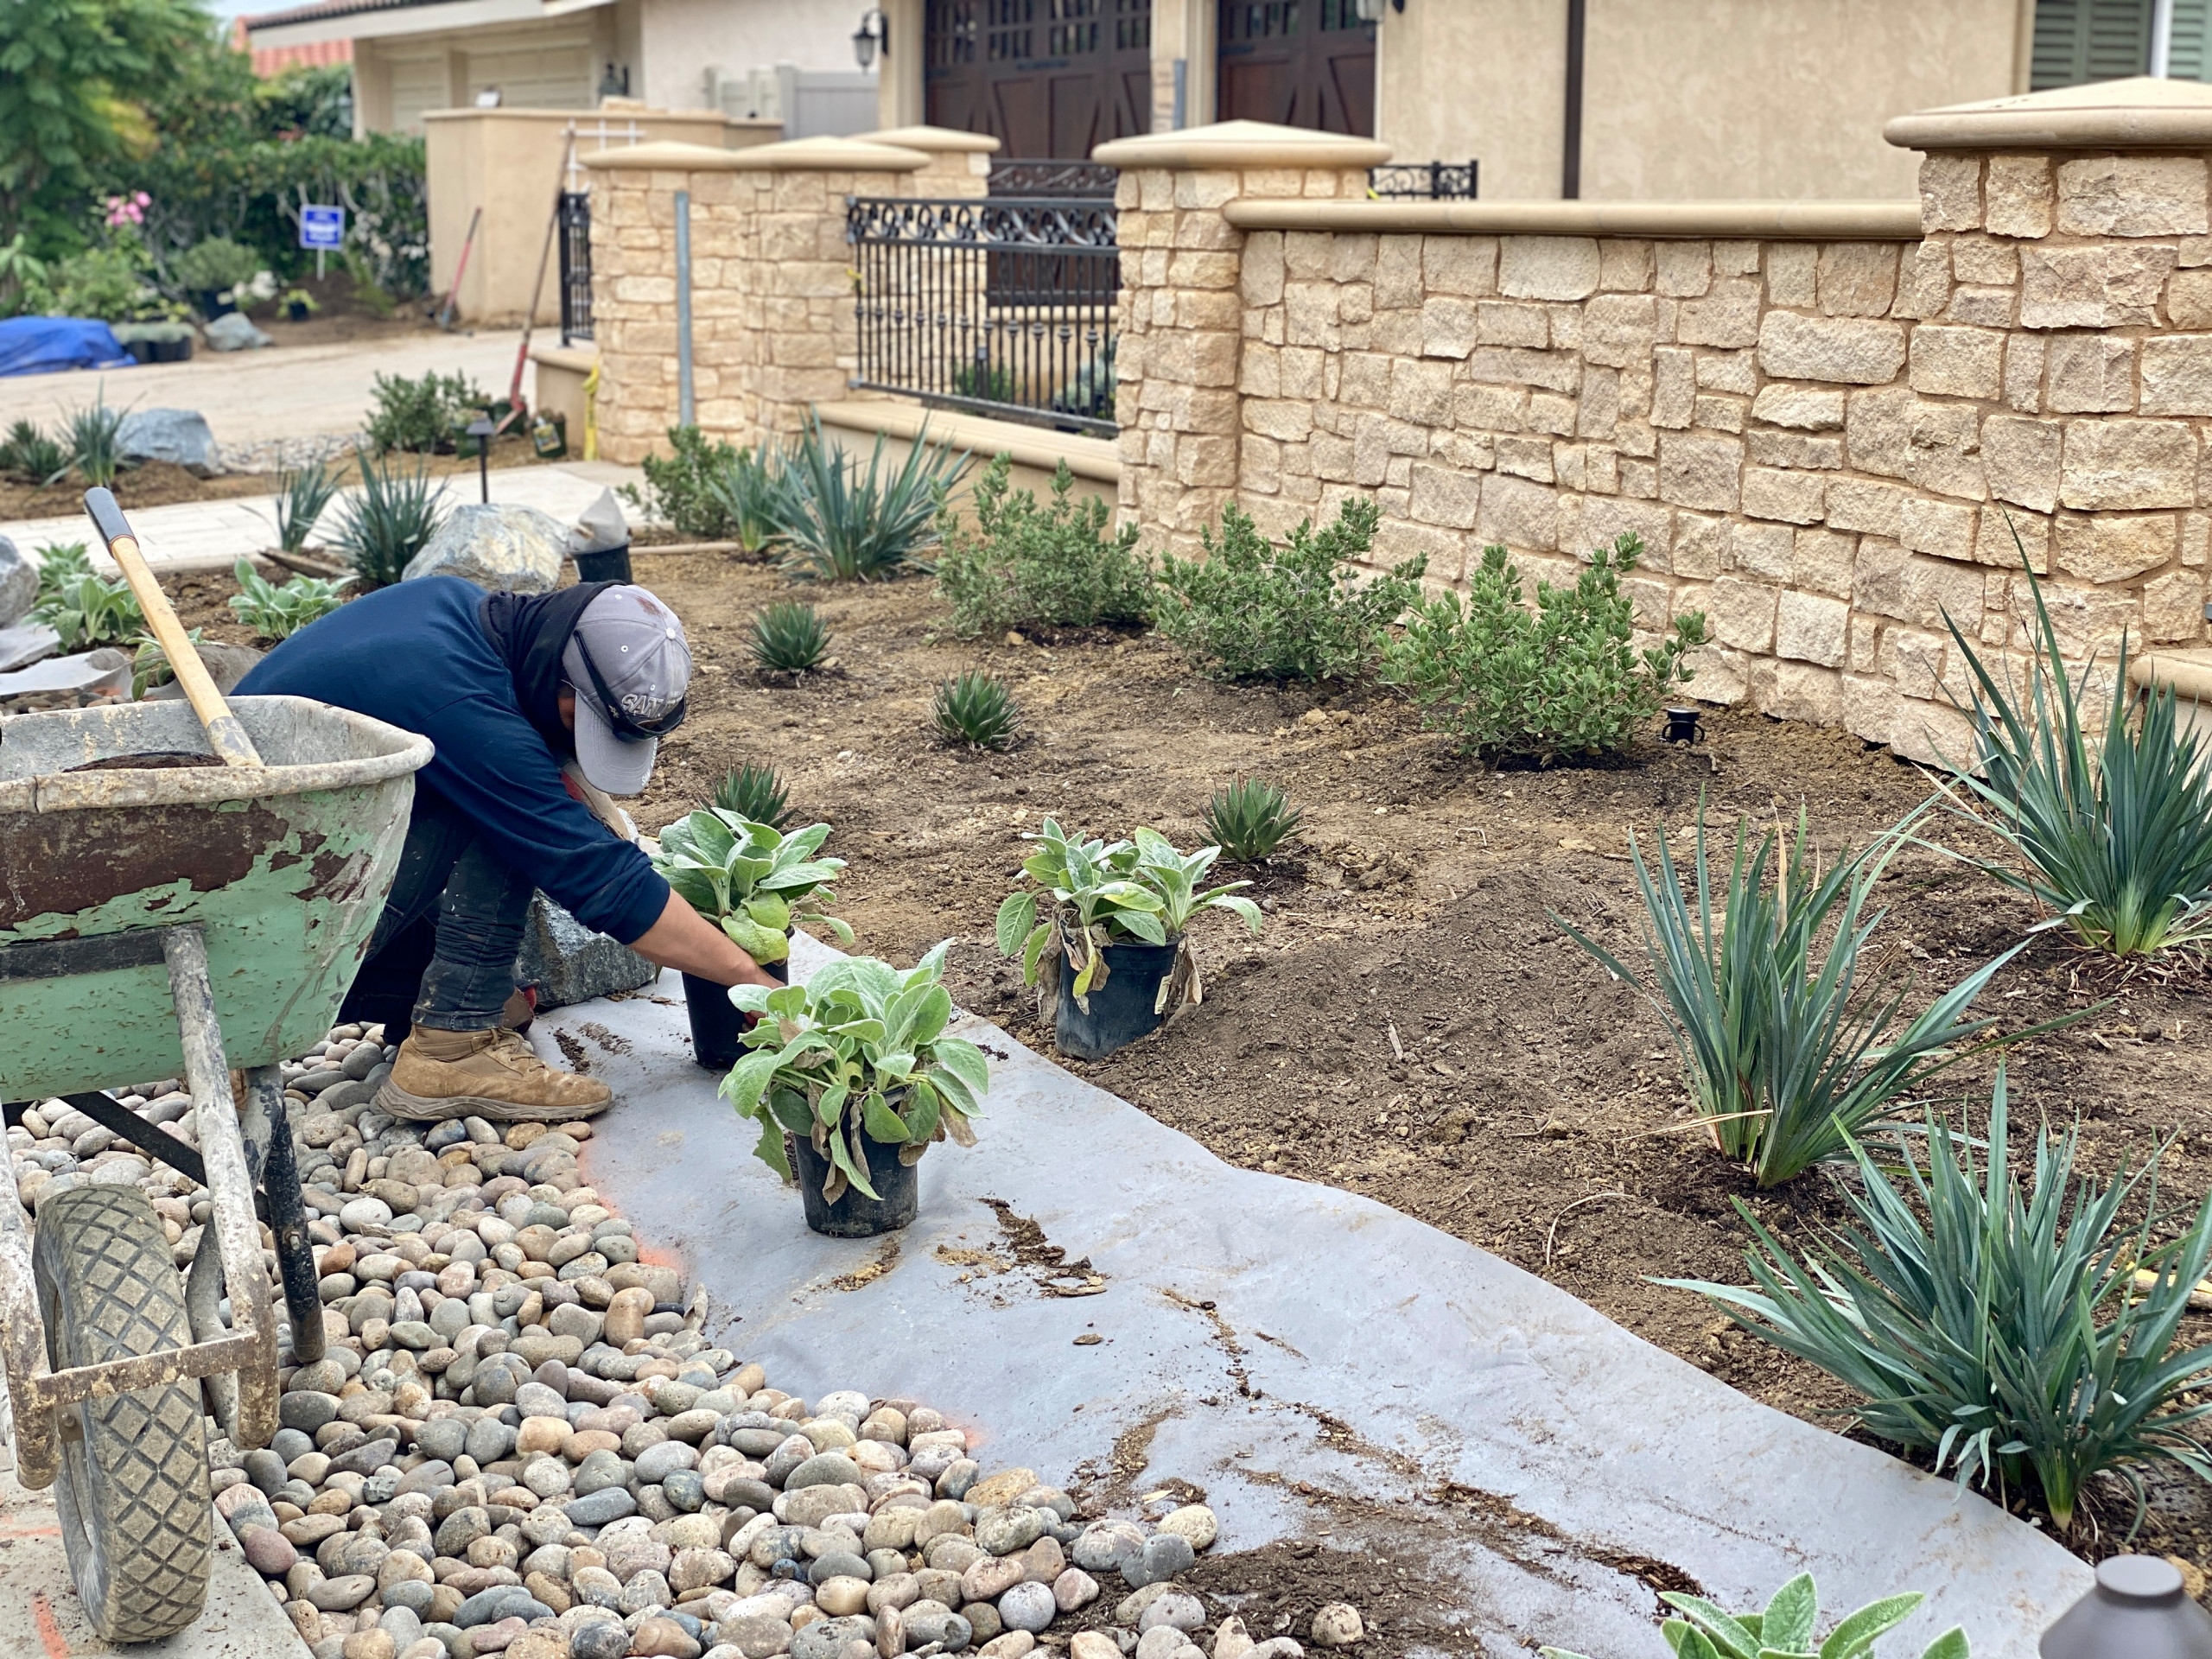 Installing New Plants Material in La Jolla